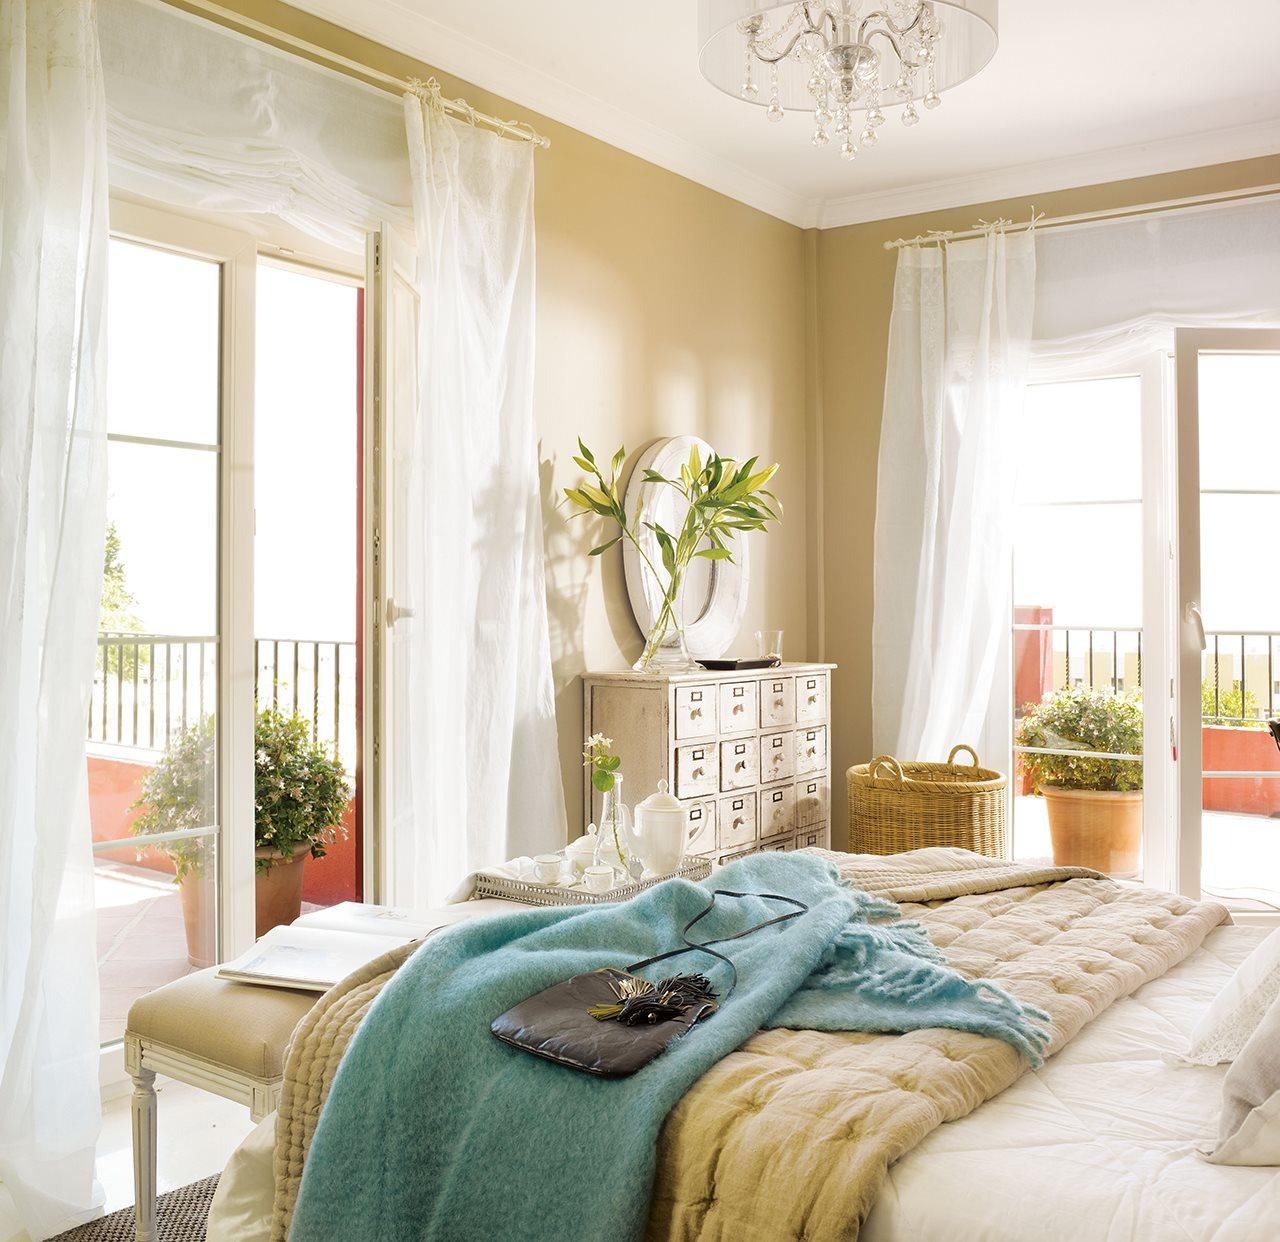 20 ideas para renovar tu casa a todo color - Dormitorio beige ...